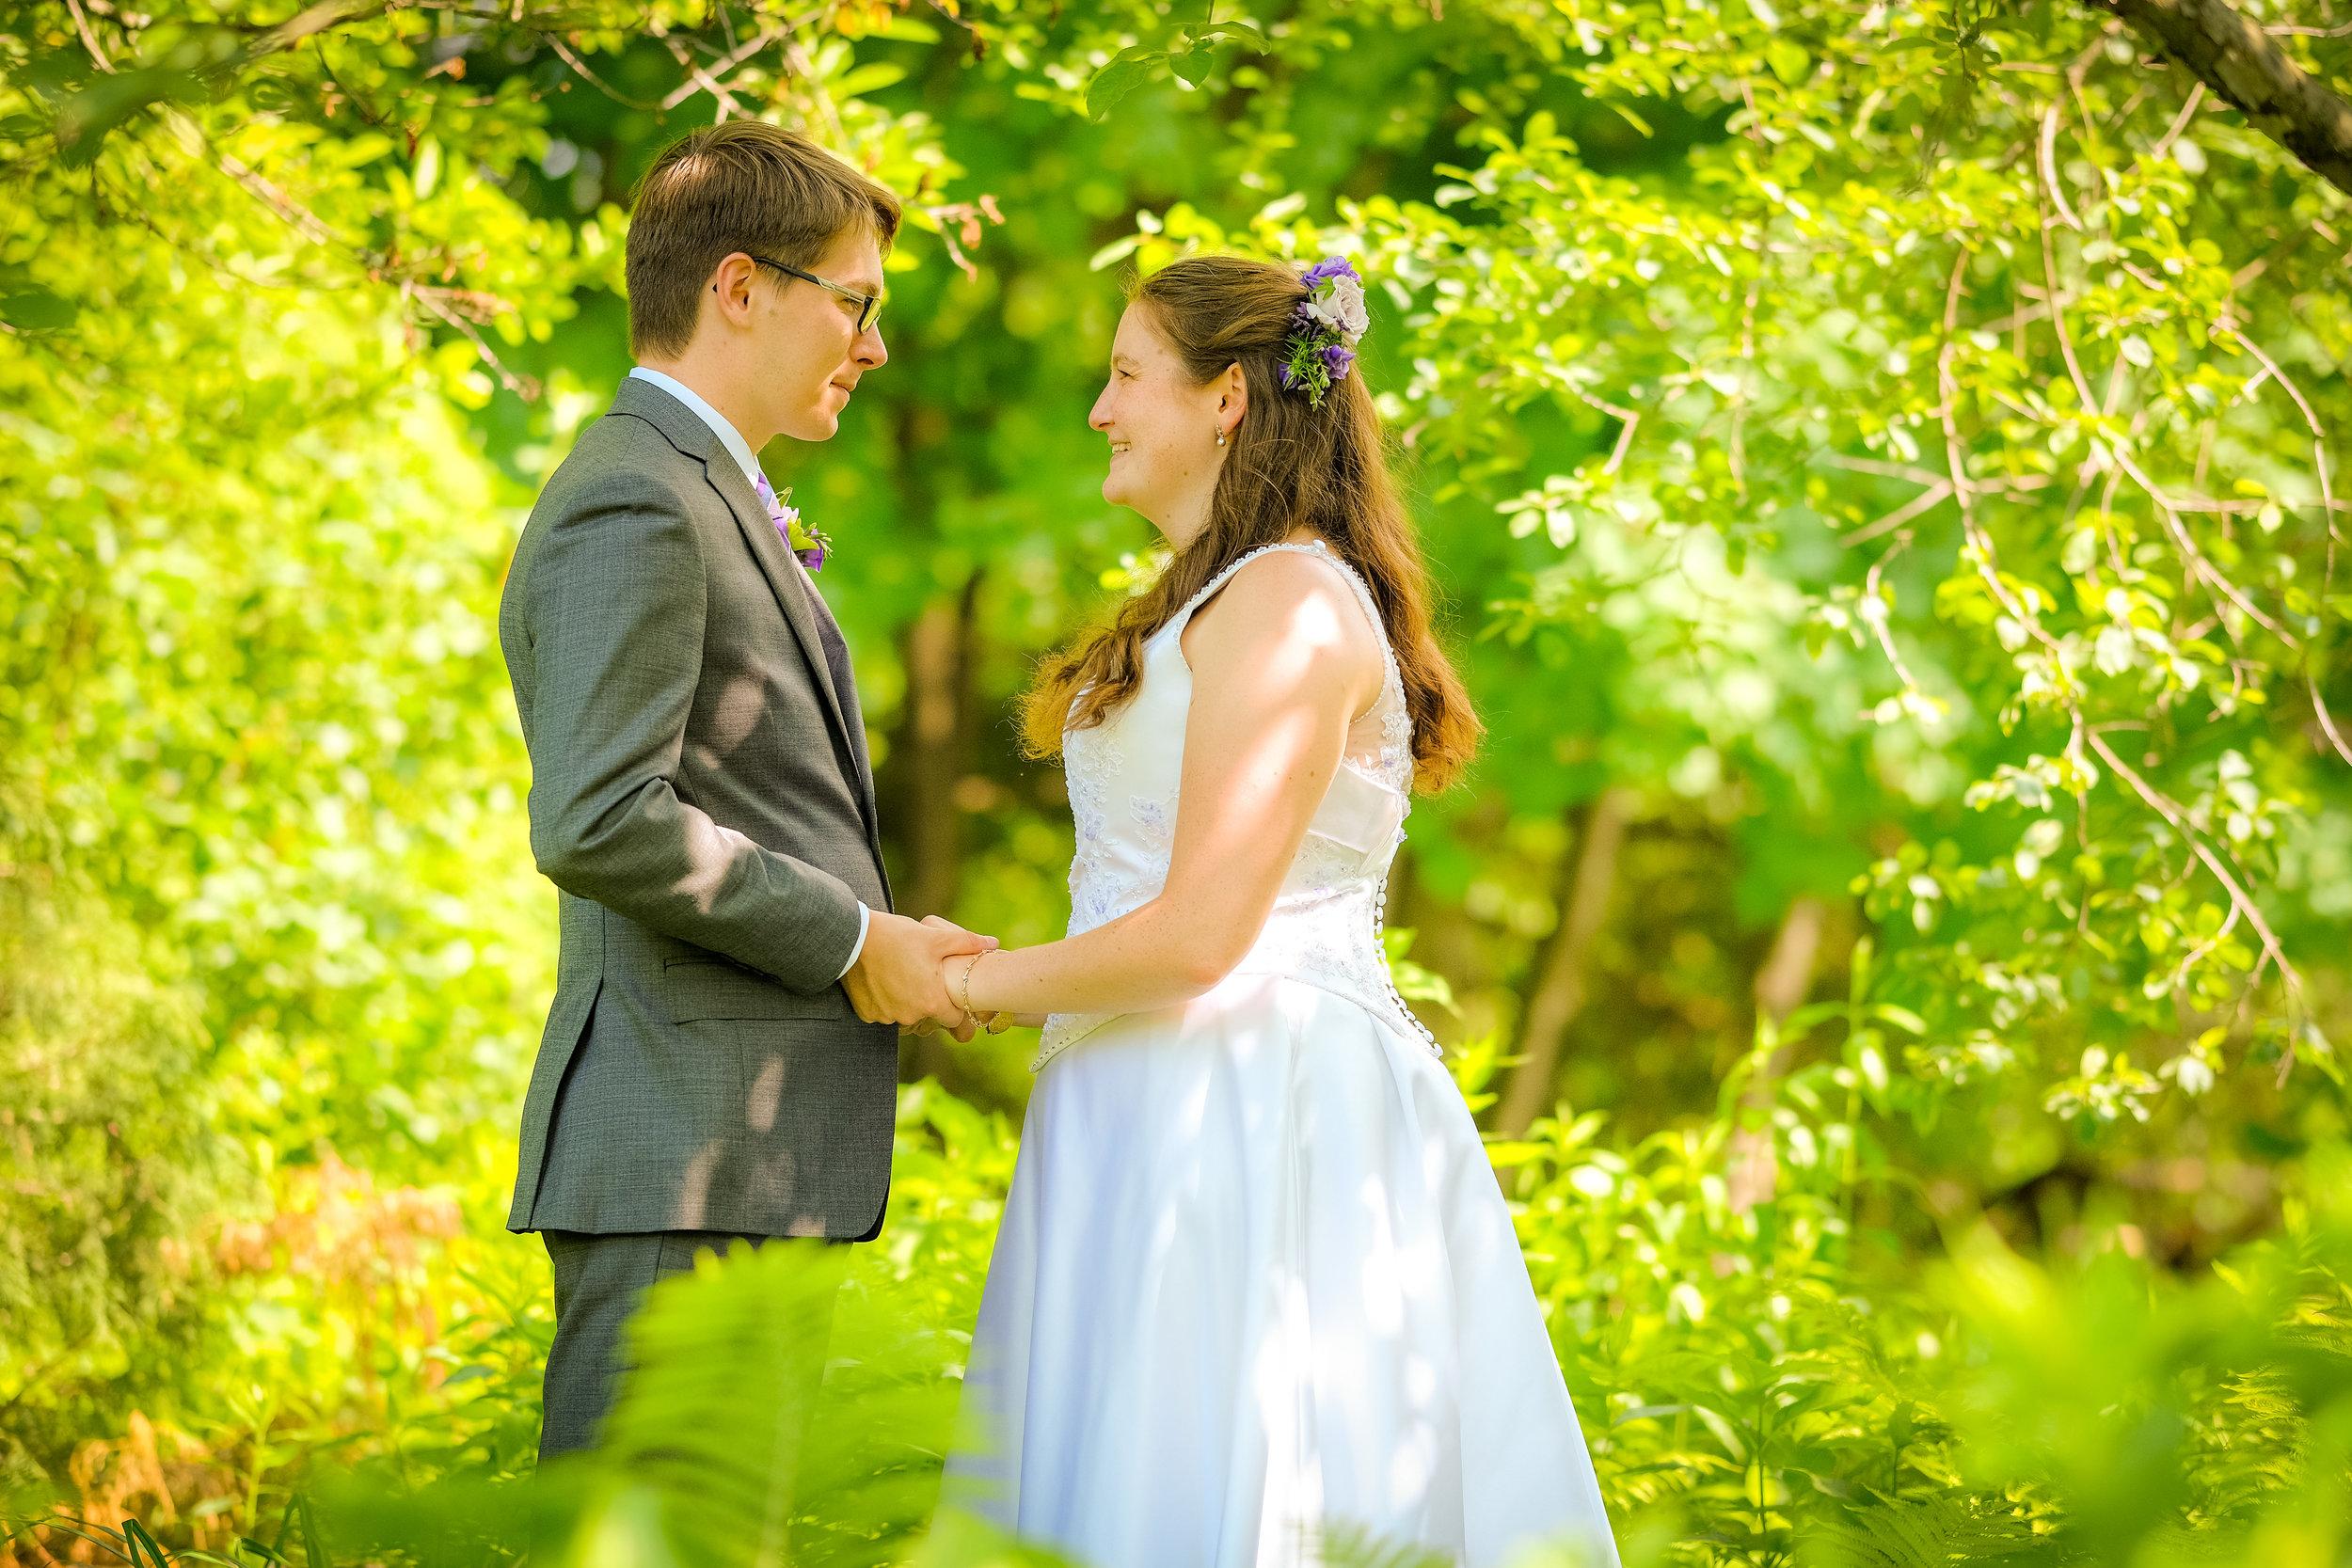 Vermont-Lilac-Inn-Wedding-Photography-474.jpg